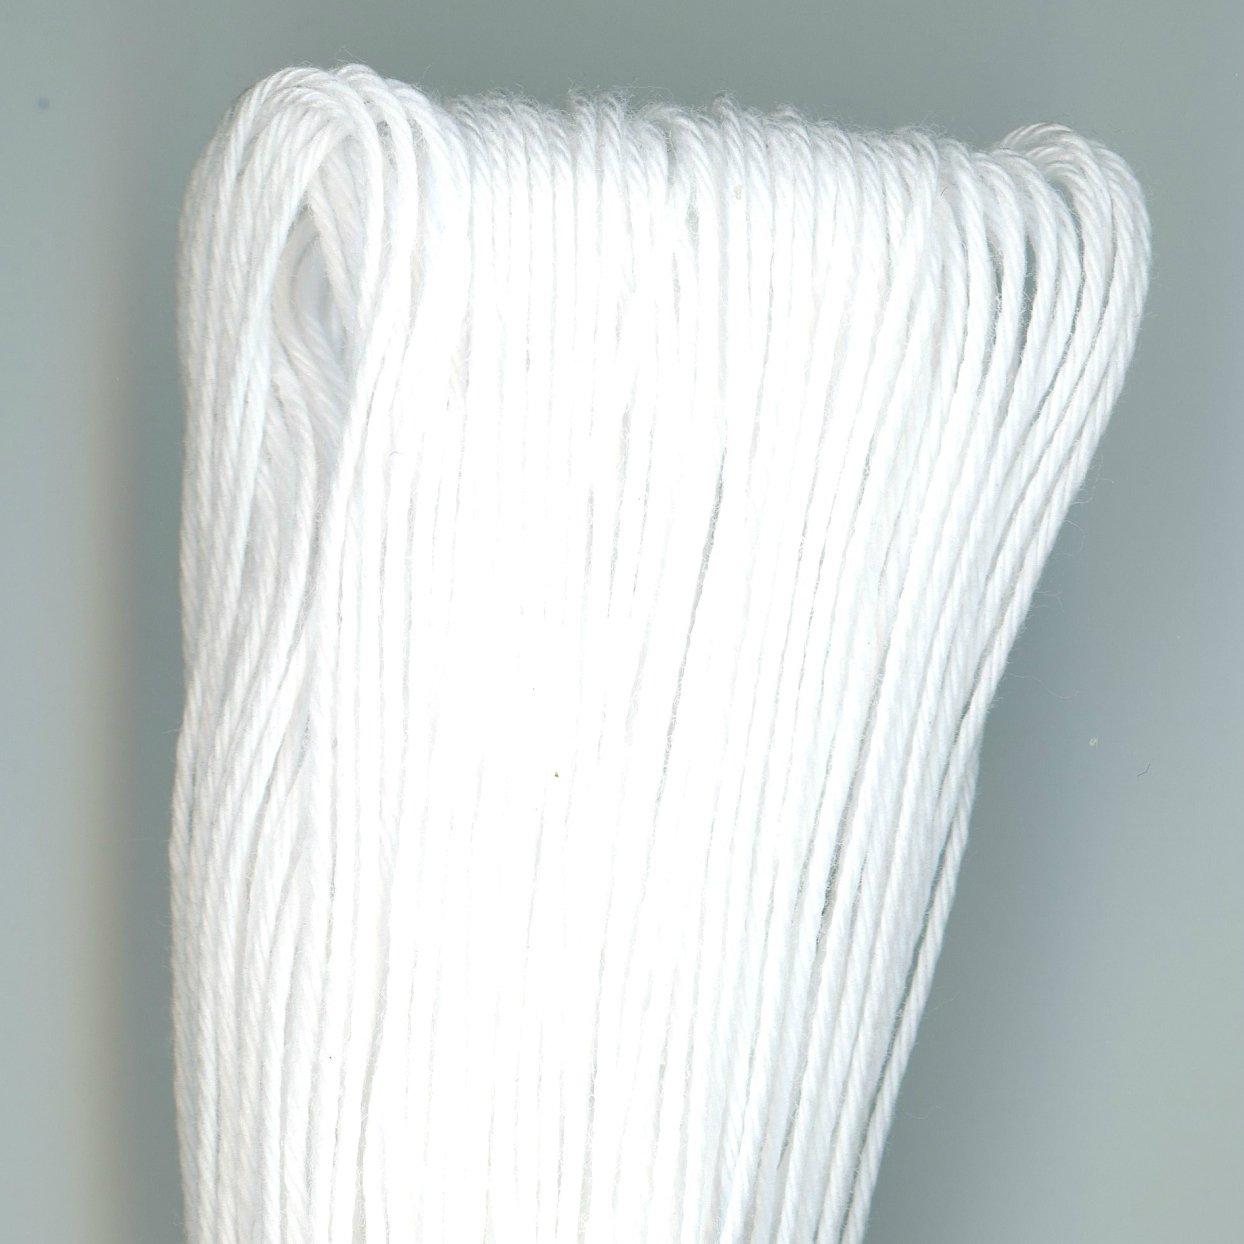 Yokota Numees 40M Sashiko Boro Thread White - Very Fine Weight